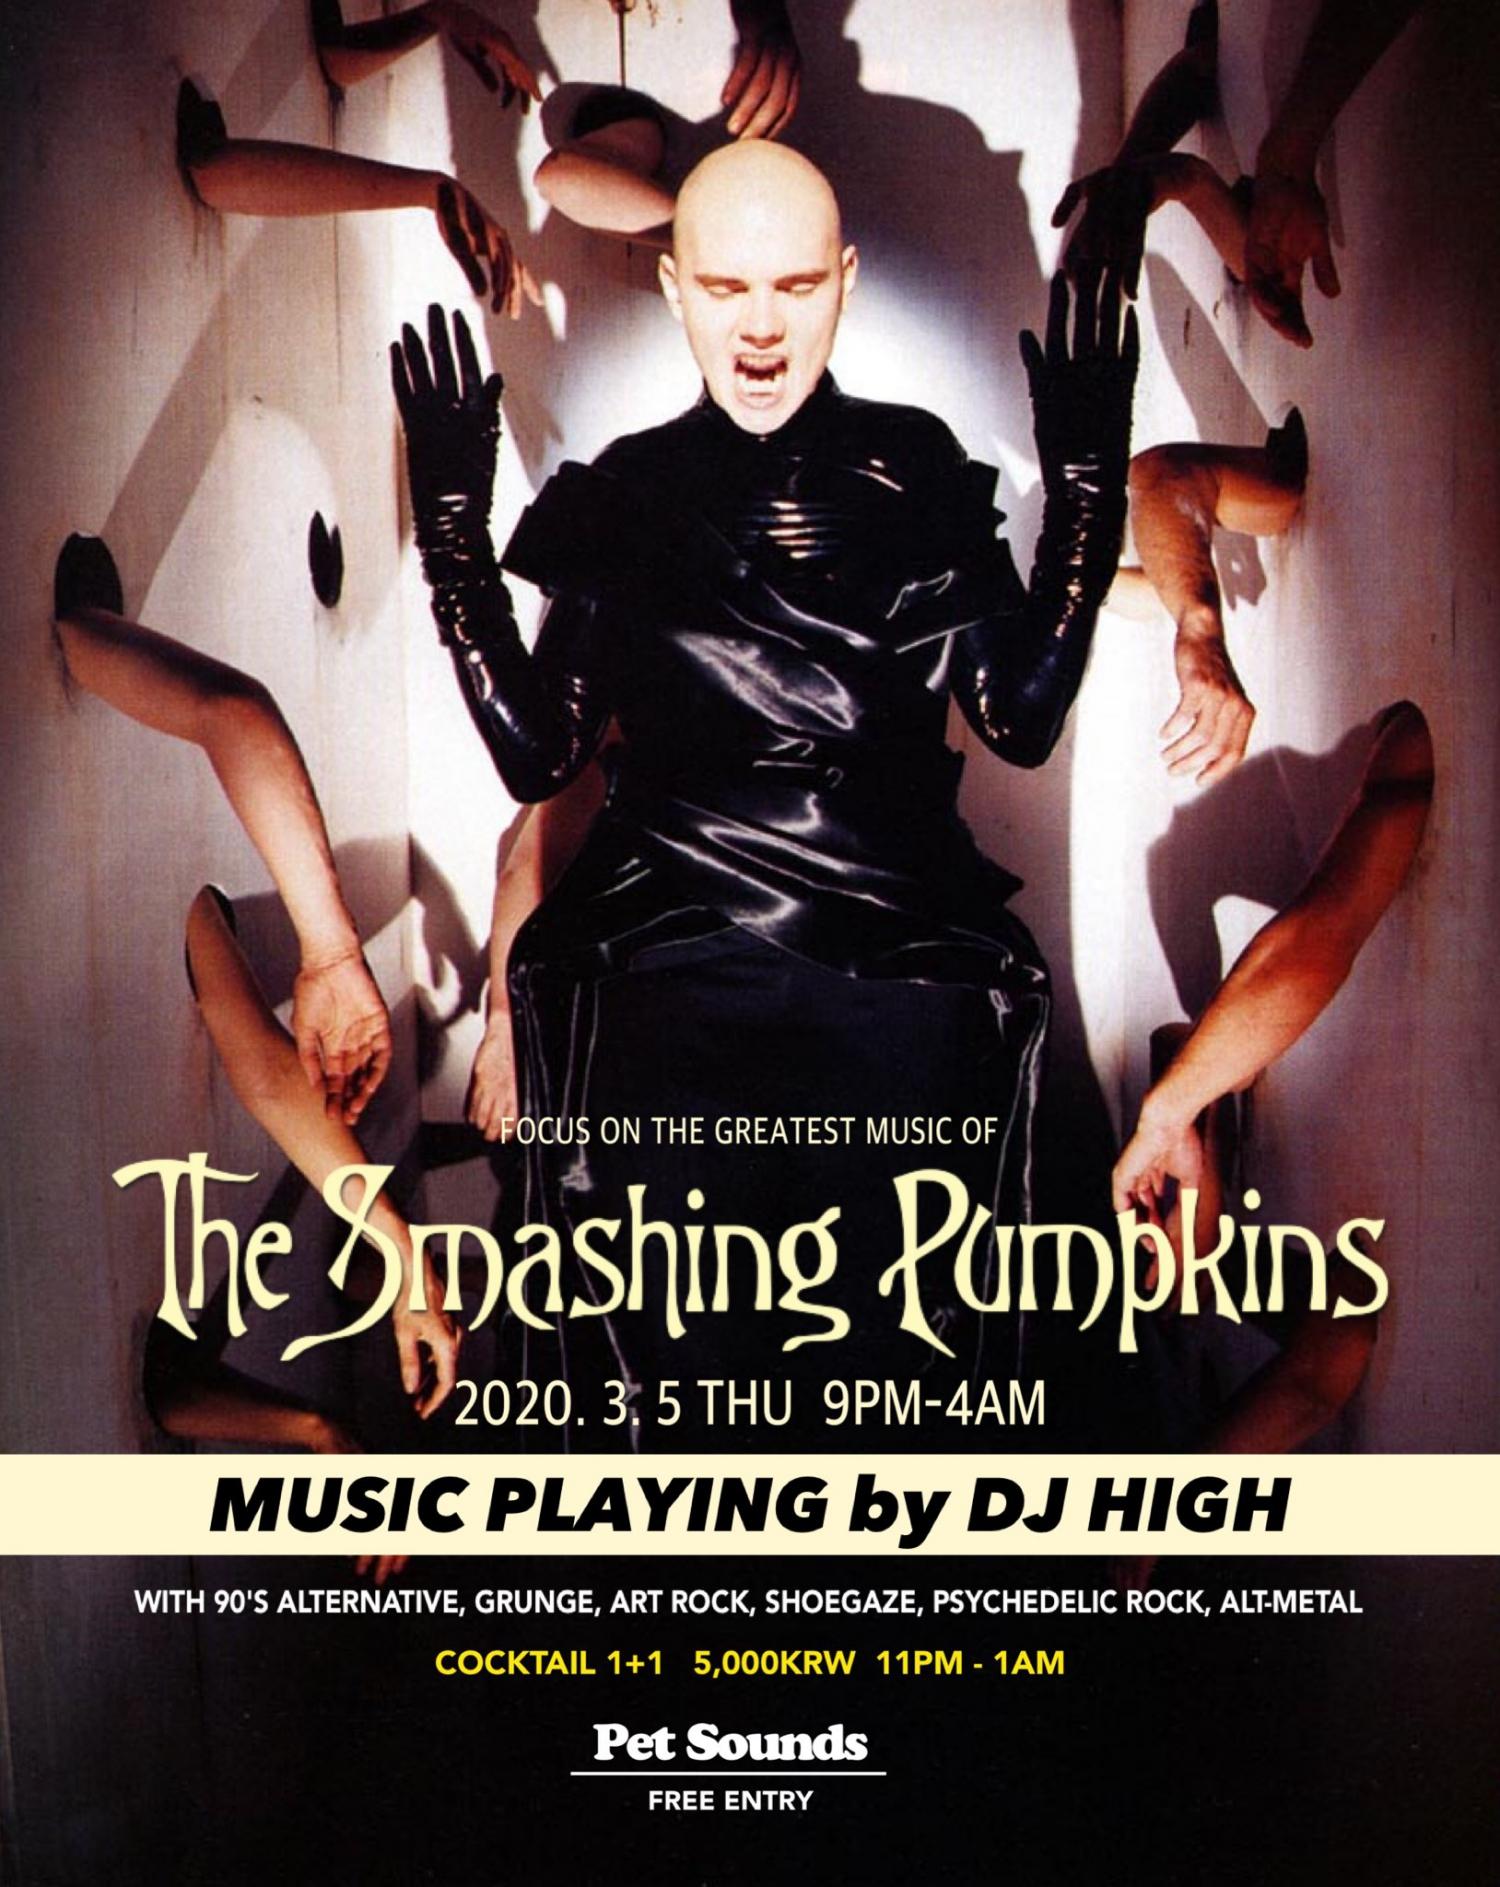 The smashing pumpkins @ Pet sounds